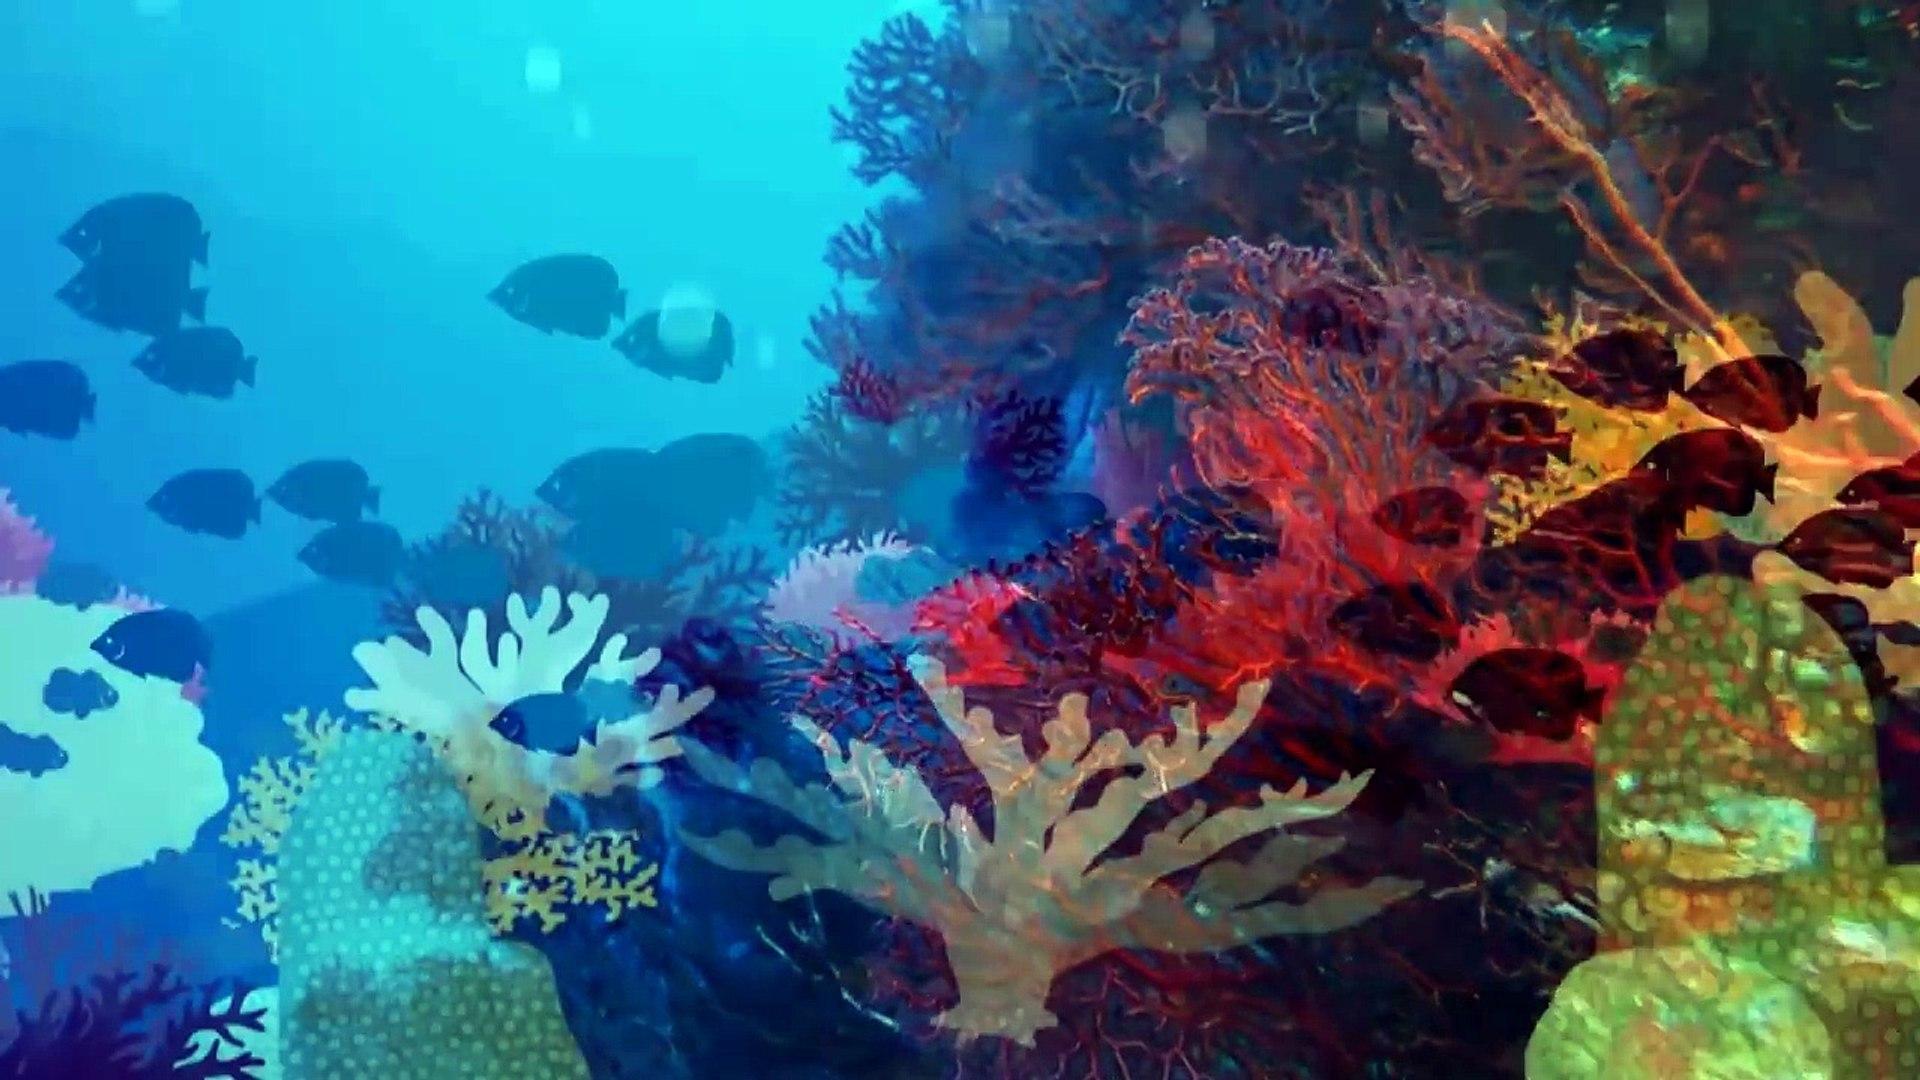 documentary | world ocean day | documentary bbc science | documentary science |